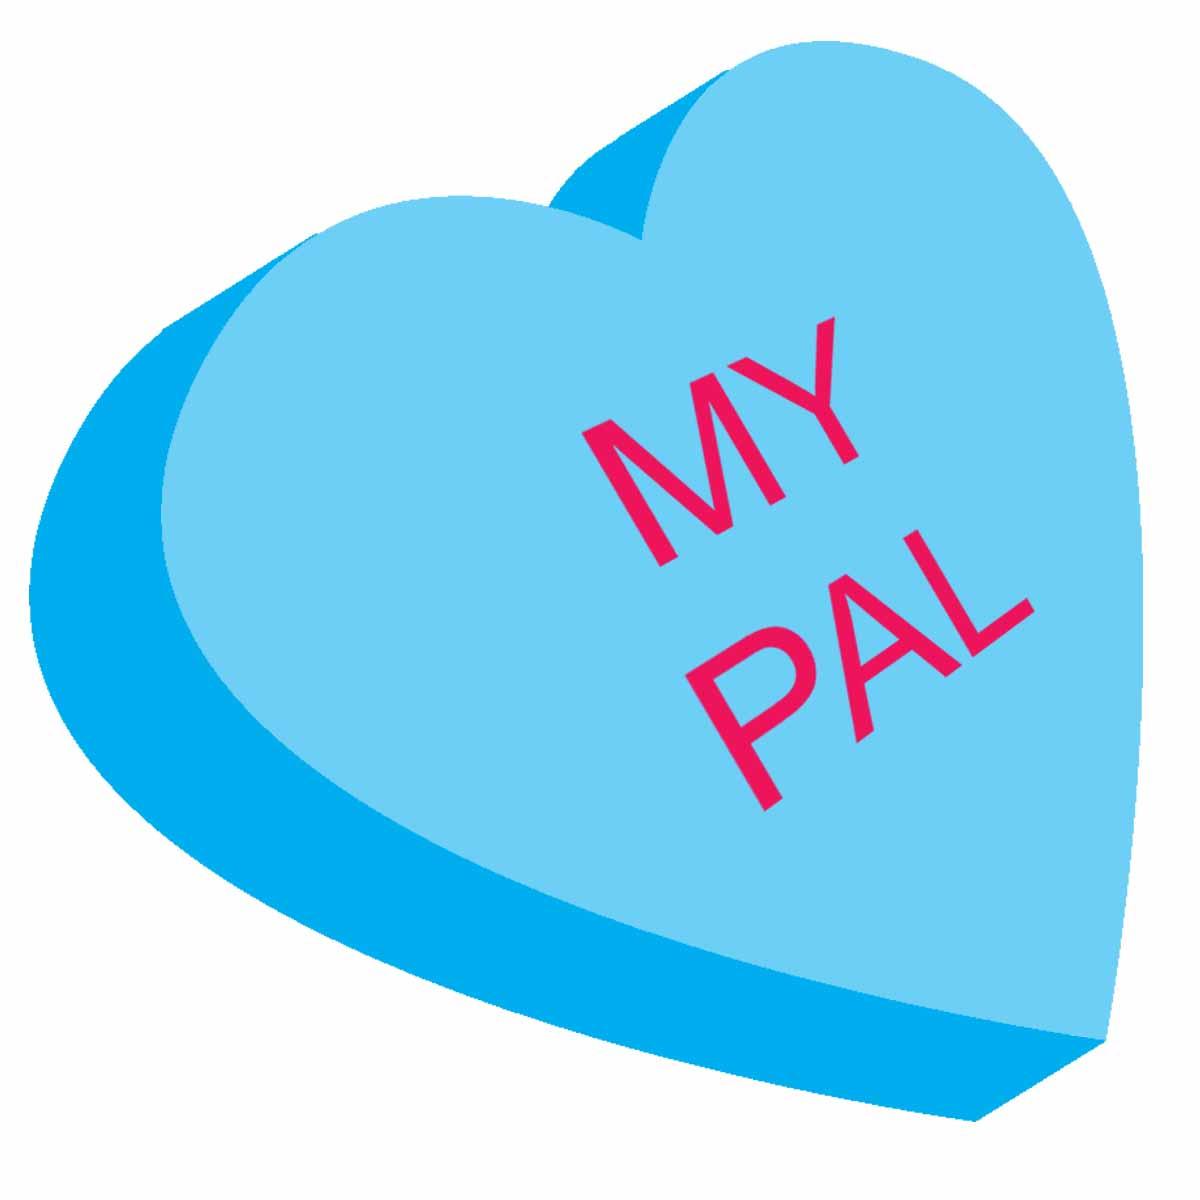 Clip art valentine hearts graphic freeuse download Valentine candy hearts clip art - ClipartFest graphic freeuse download